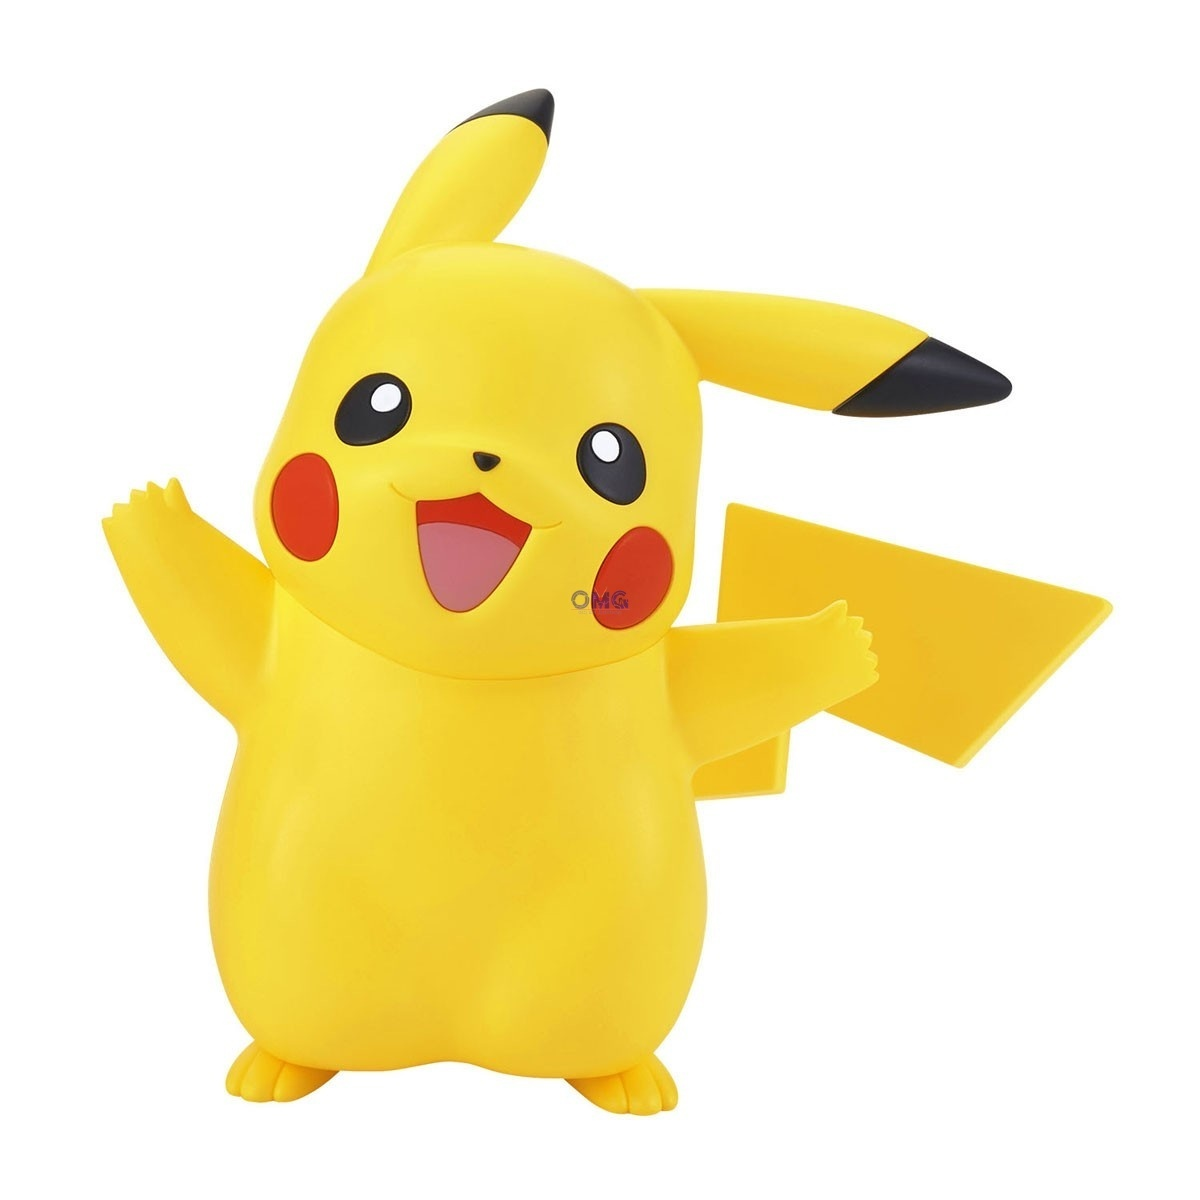 Bandai Pokémon PLAMO COLLECTION QUICK!! 01 Pikachu 1.0.jpg